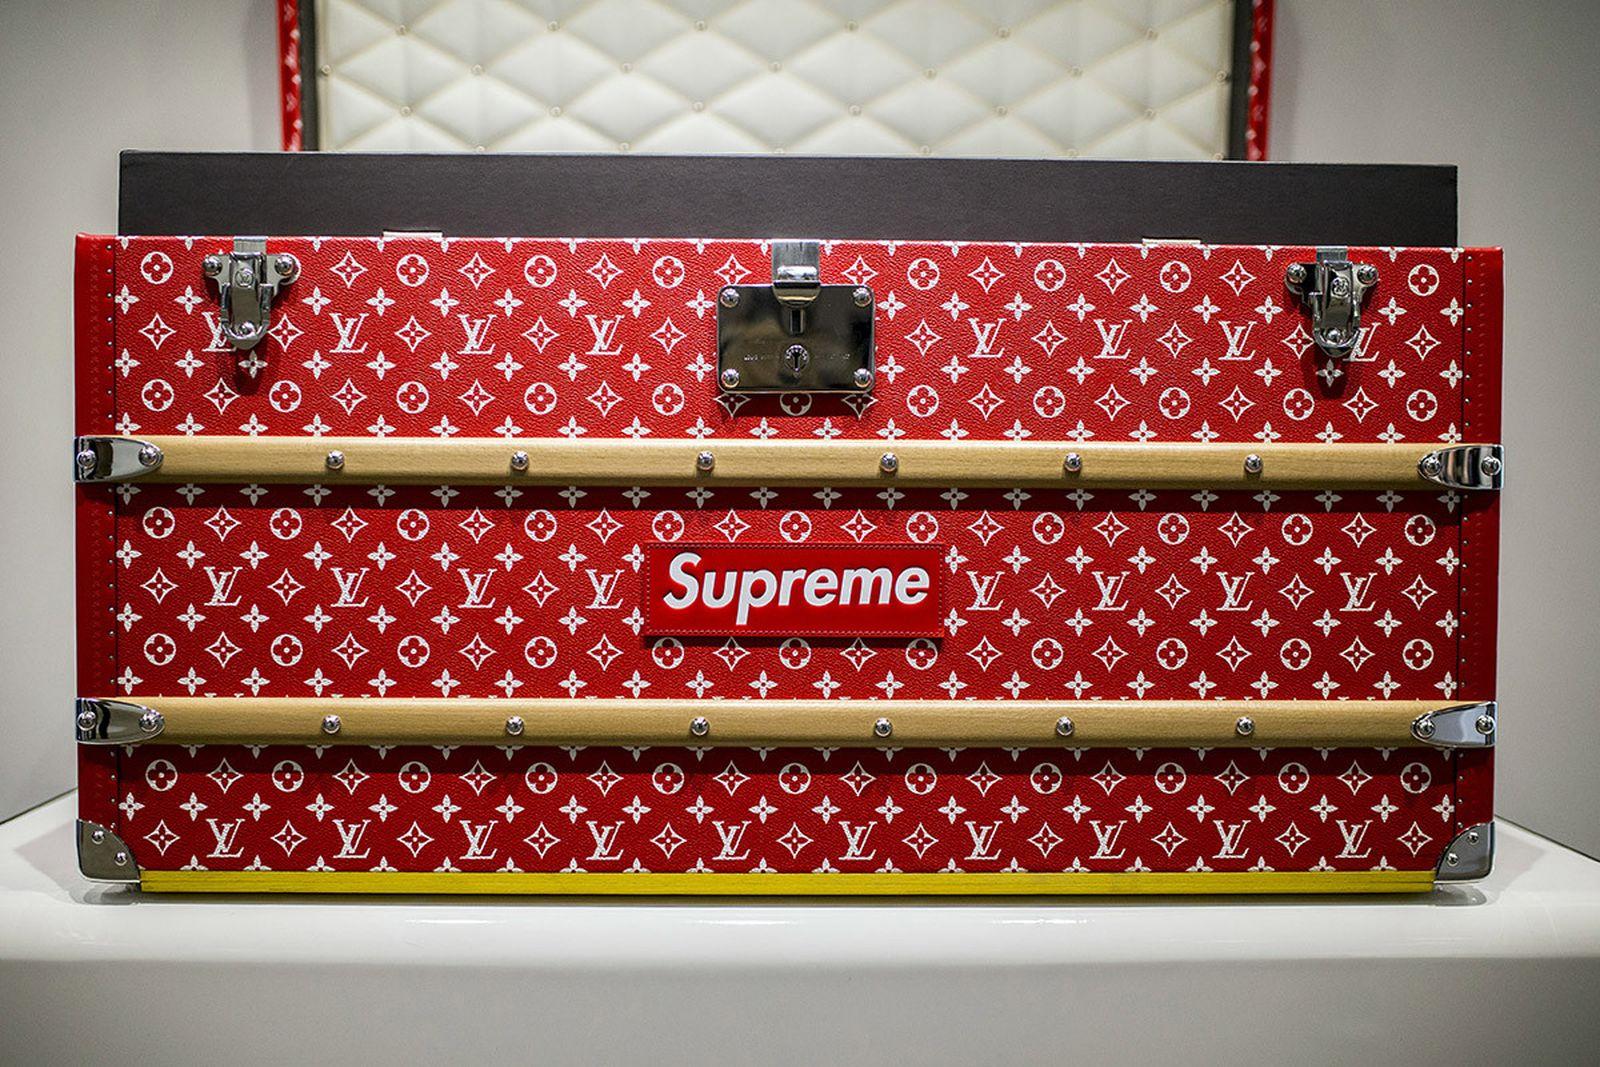 supreme-auction-1-million-in-sales-01